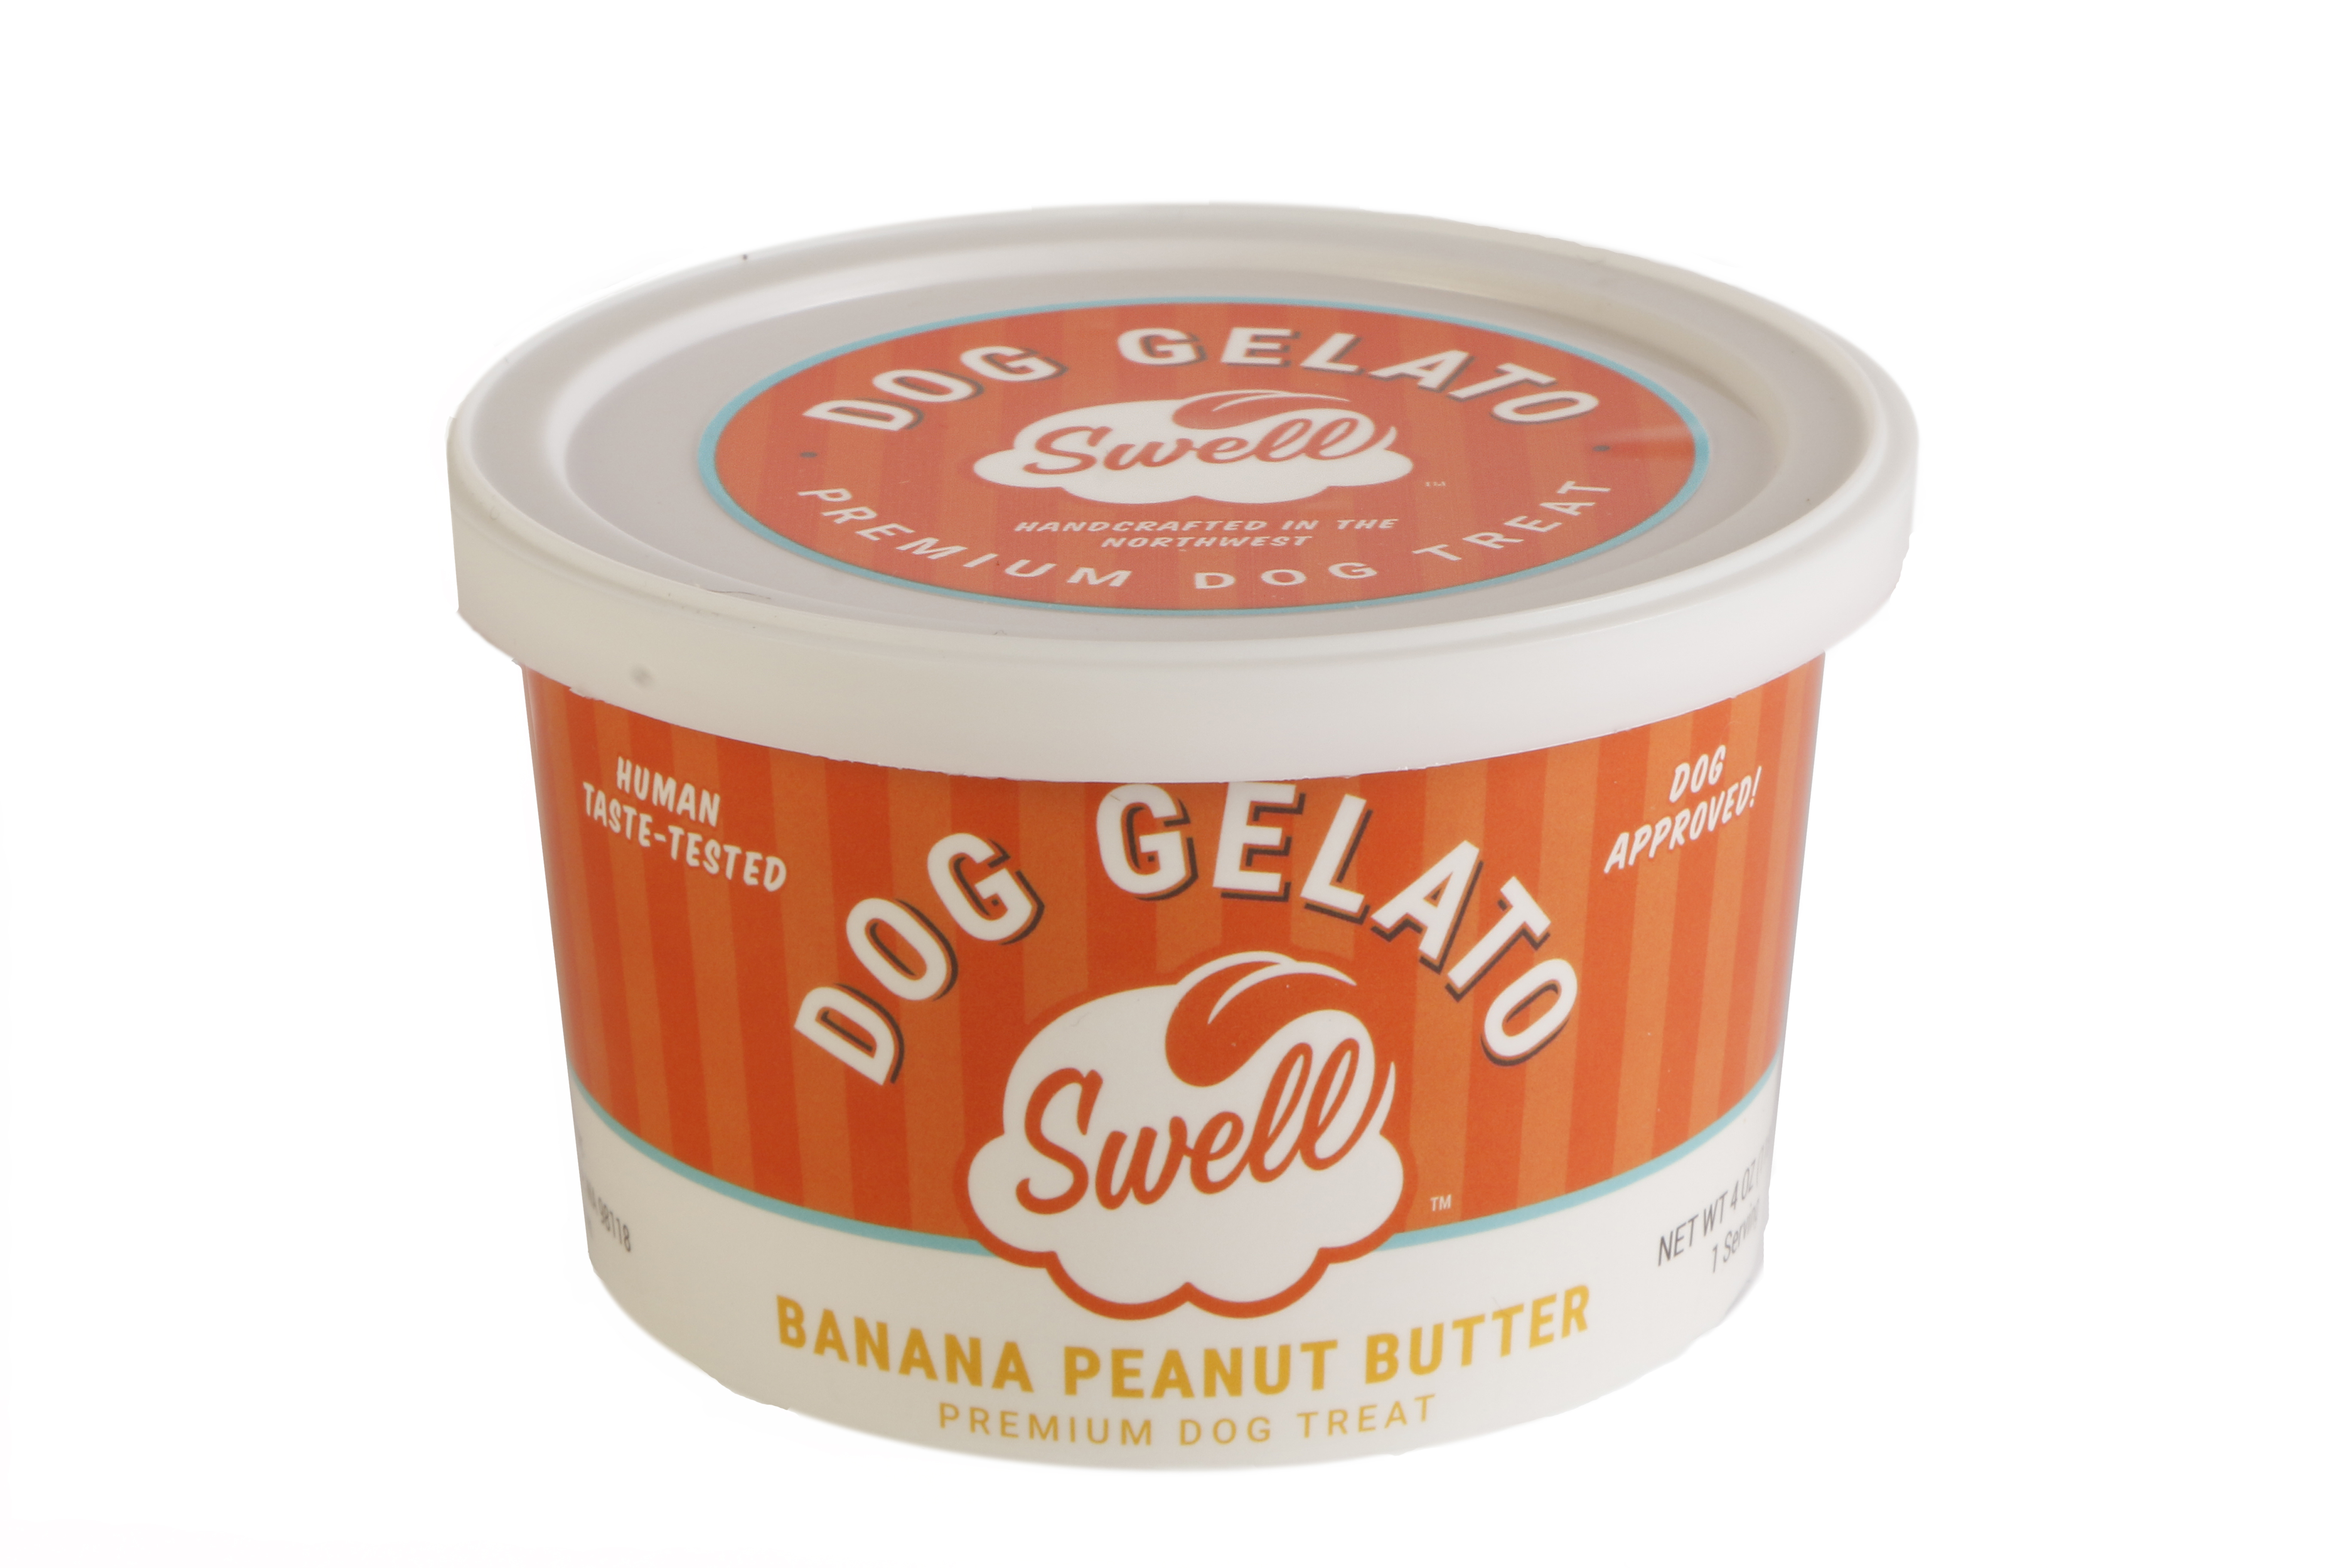 Swell Gelato Banana Peanut Butter Dog Treats, 4-oz